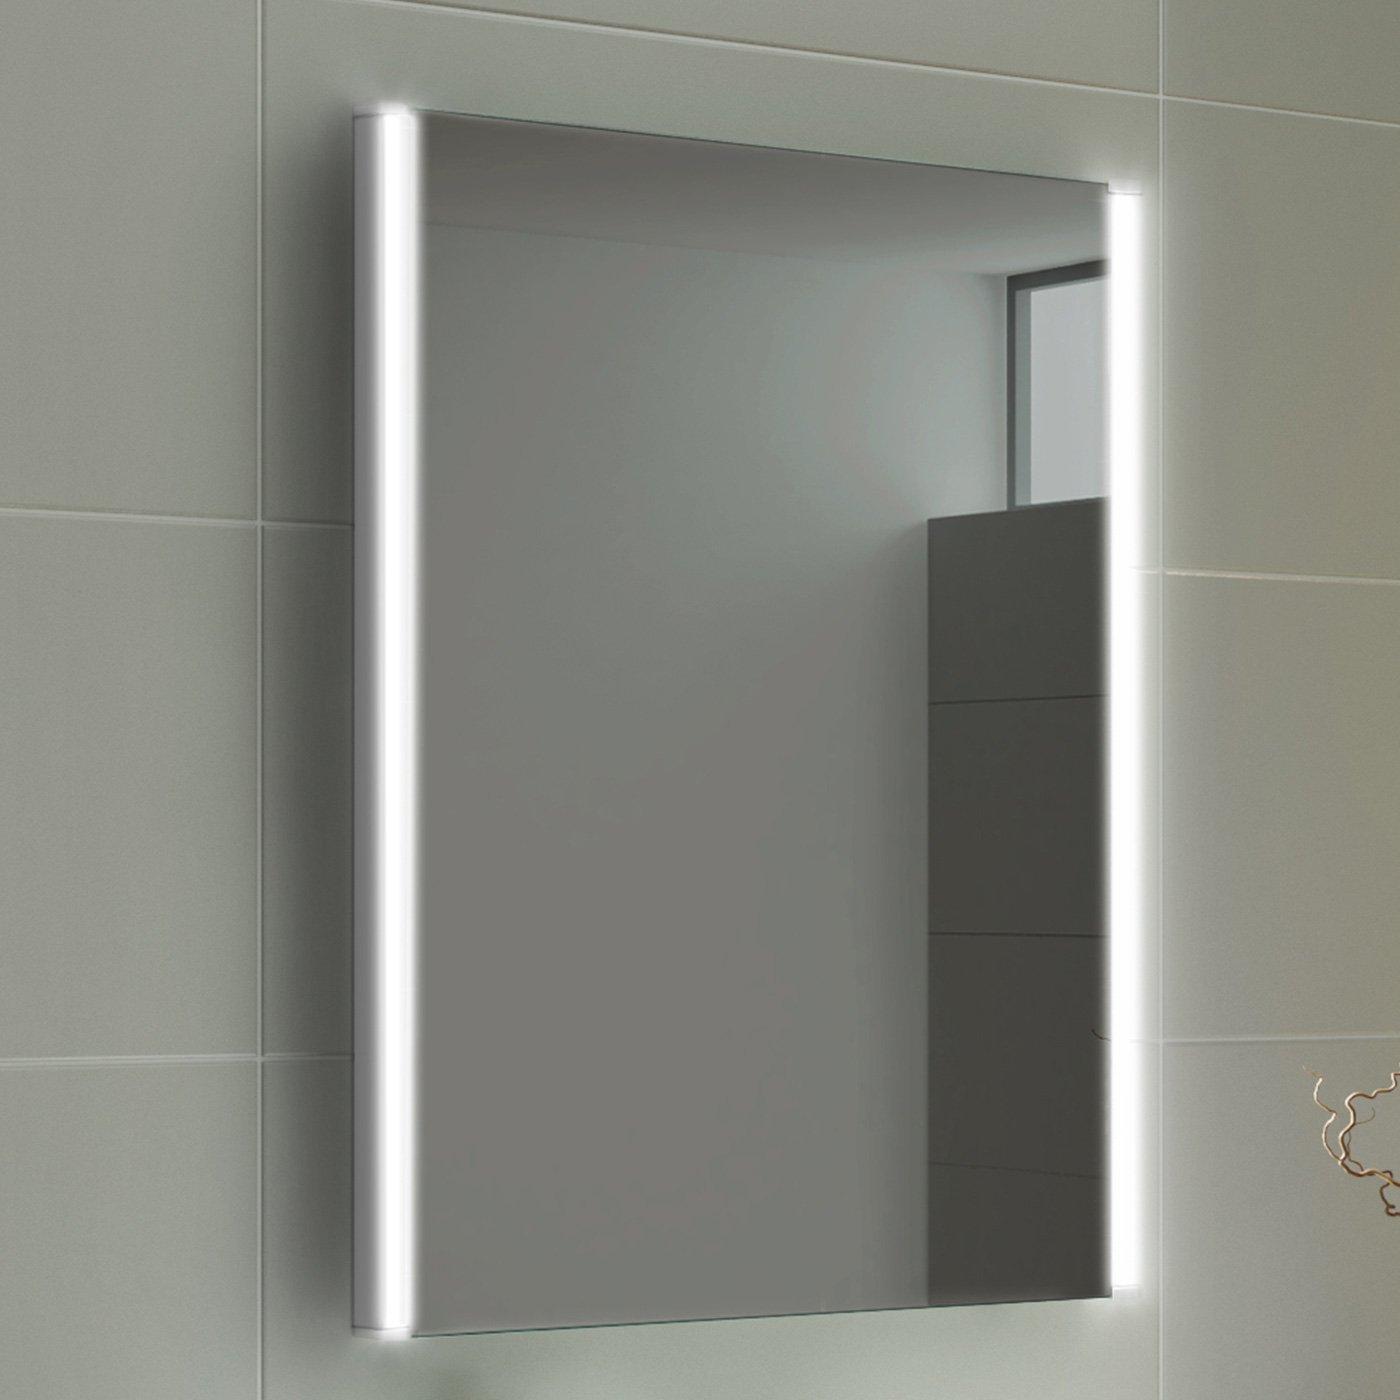 Warmiehomy Modern Illuminated LED Bathroom Mirror with Lights Shaver Socket Demister and Sensor Wall Mounted 70x50cm